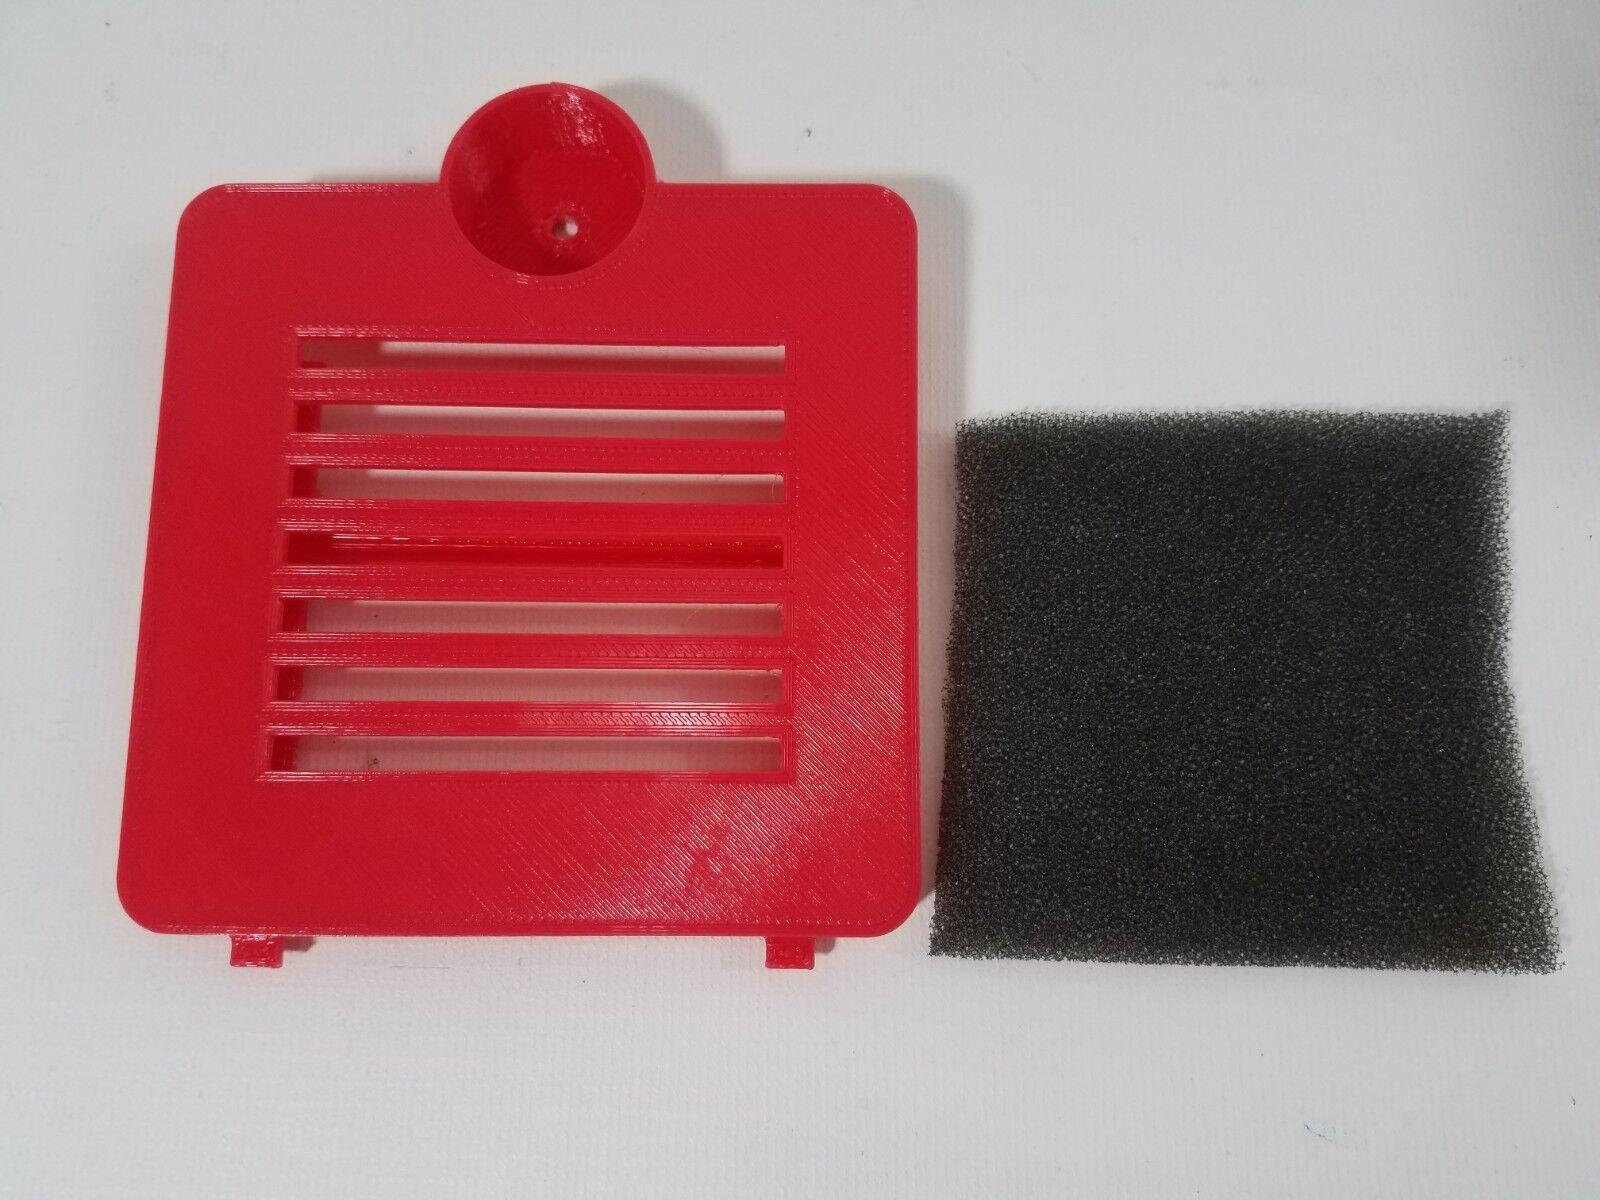 Vented Oil Fill Cover 4 HF Predator 3500 Watt Inverter Gener